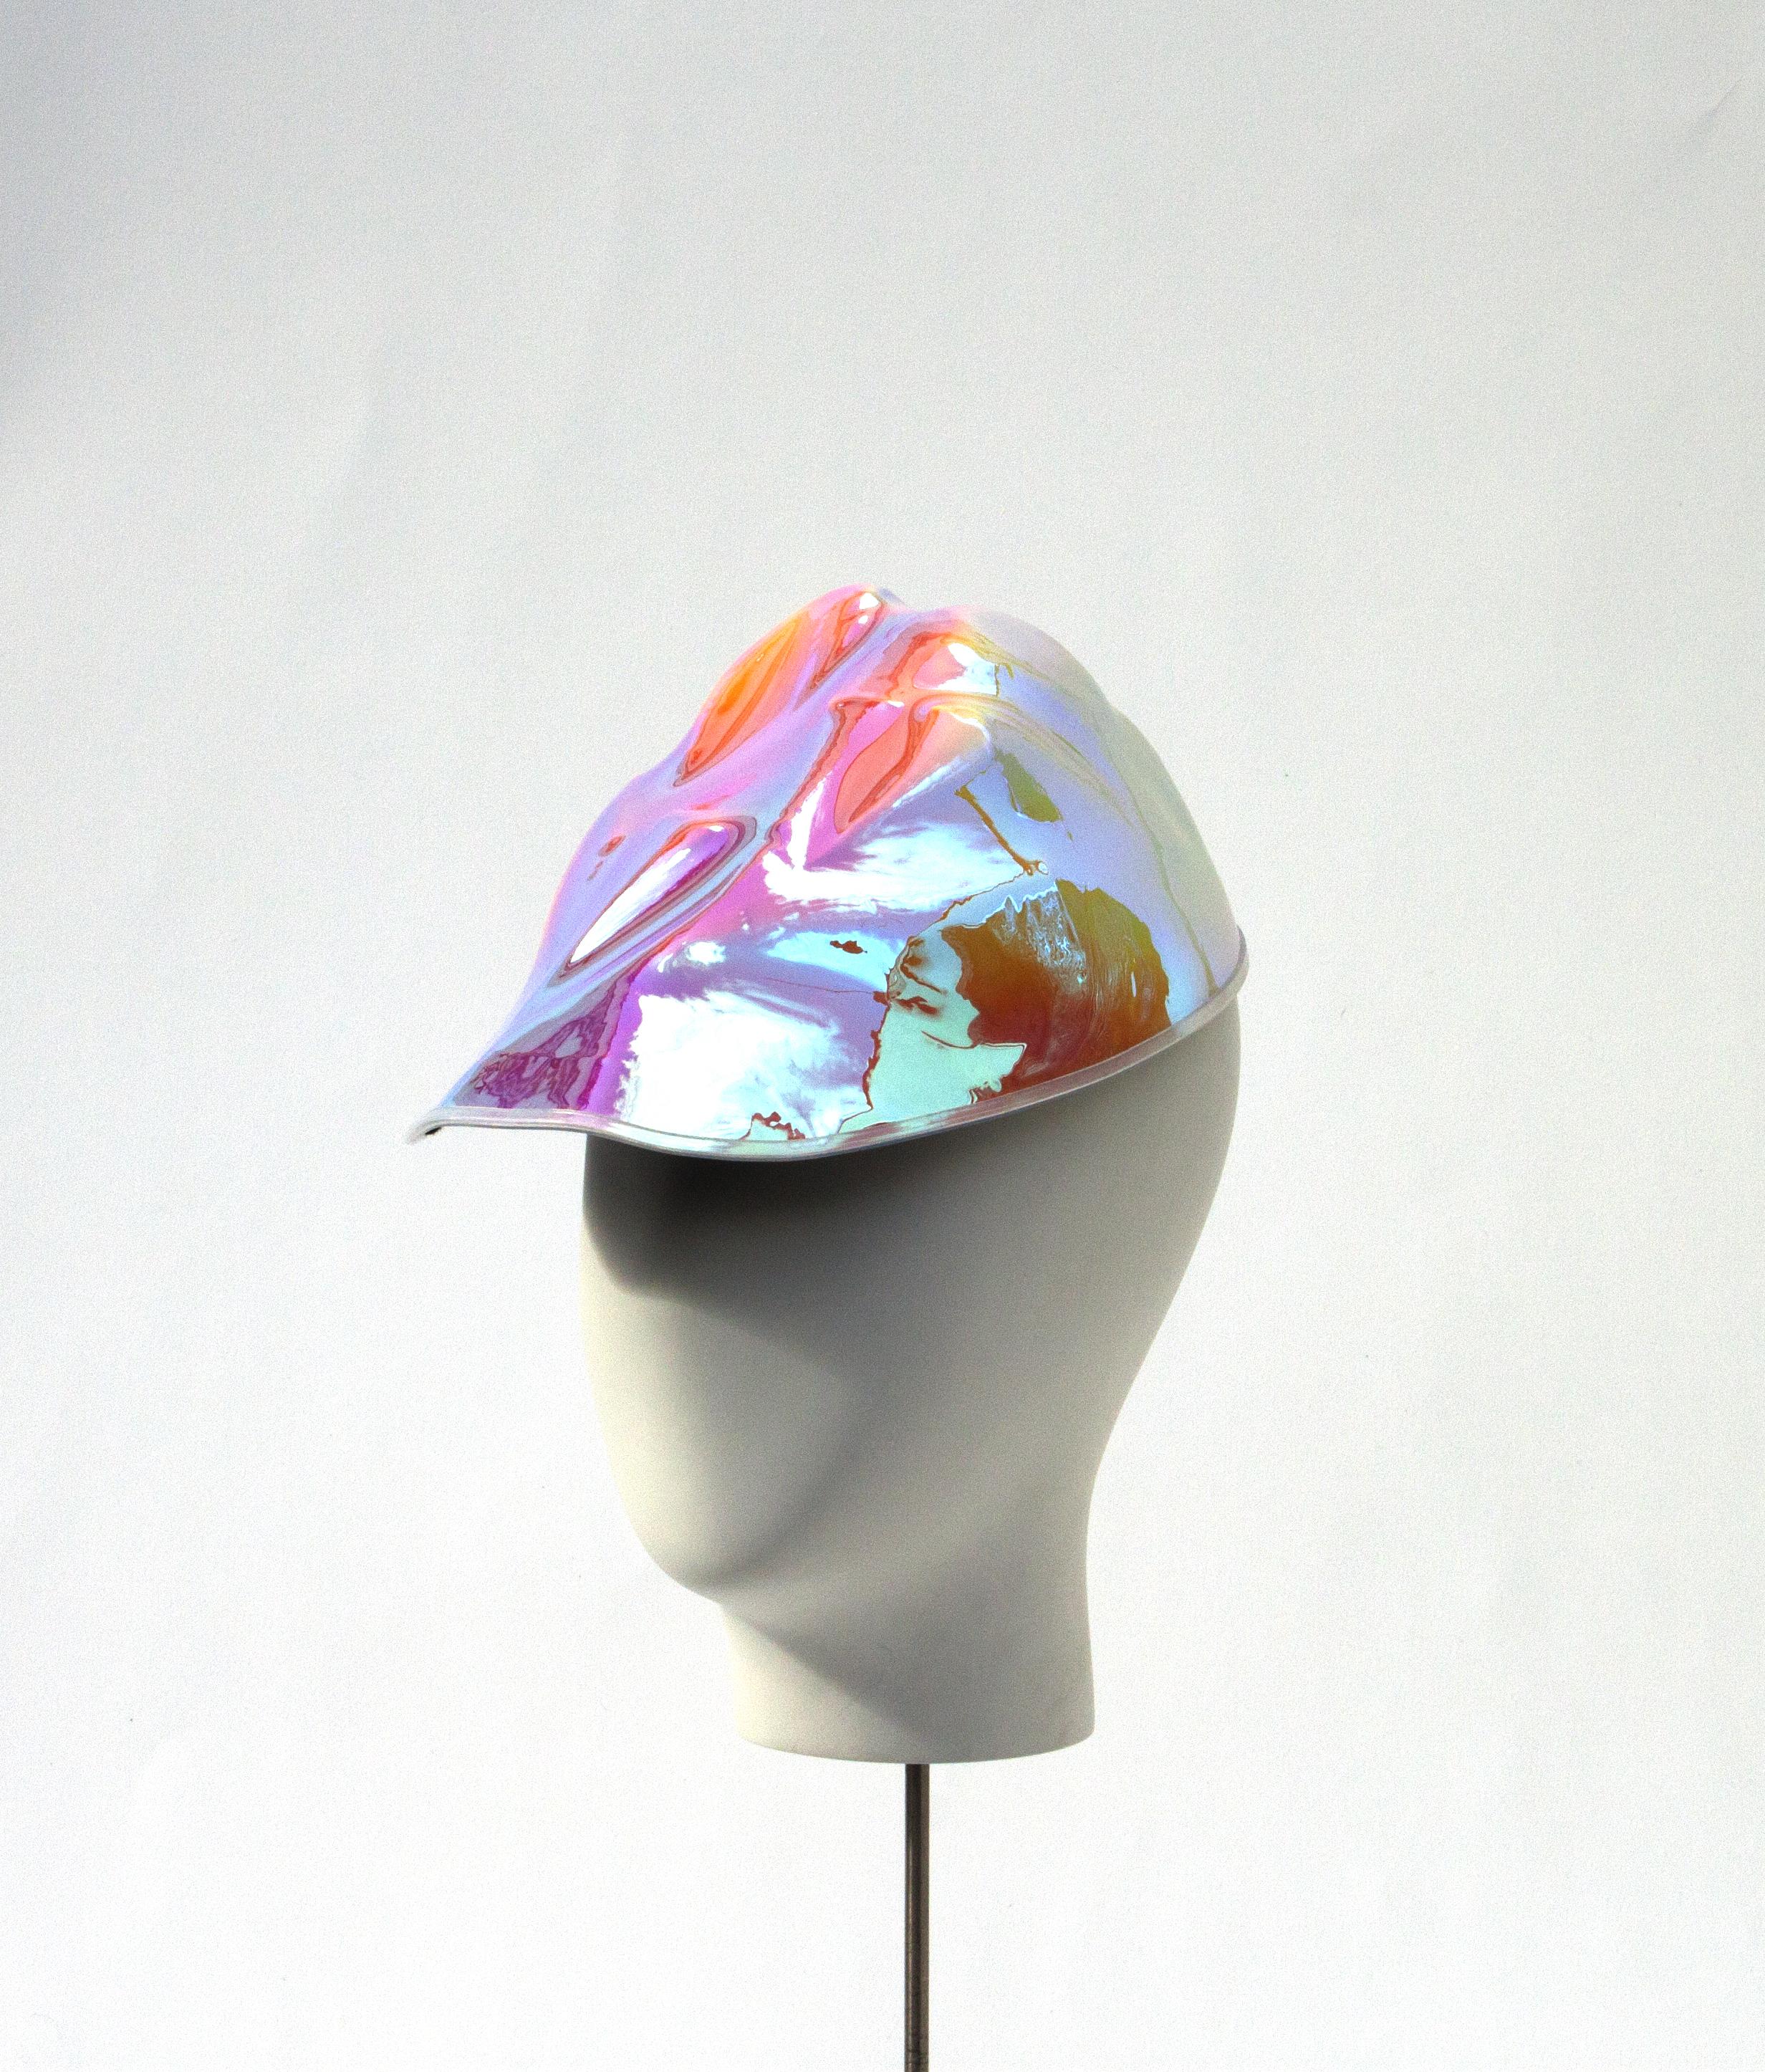 Iridescent Formed Cap